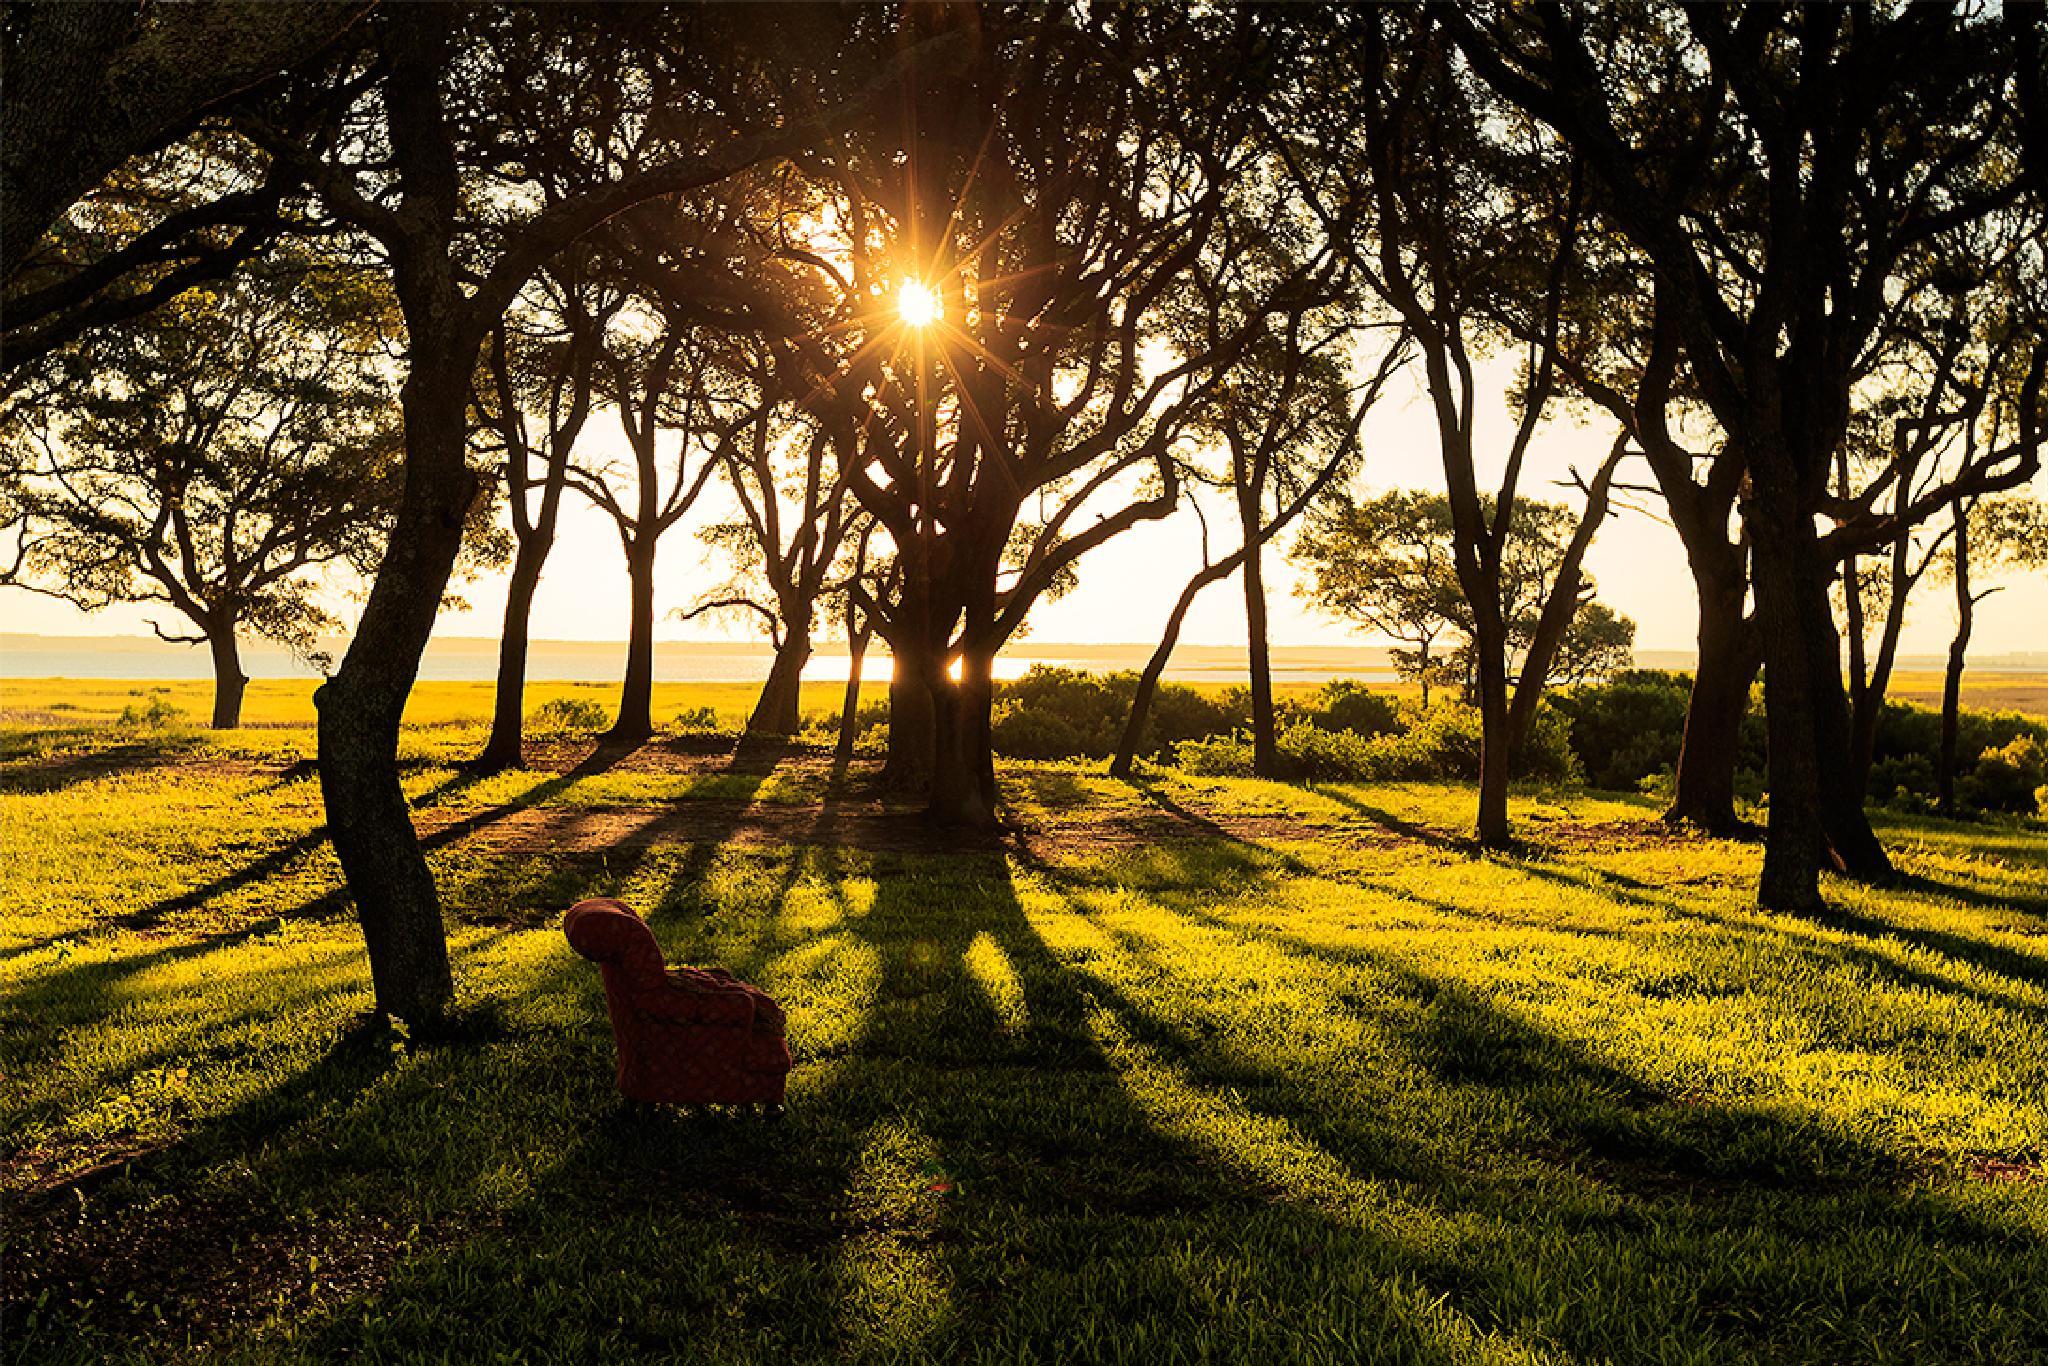 Sunset at Fort Fisher, North Carolina by Mirela Savu